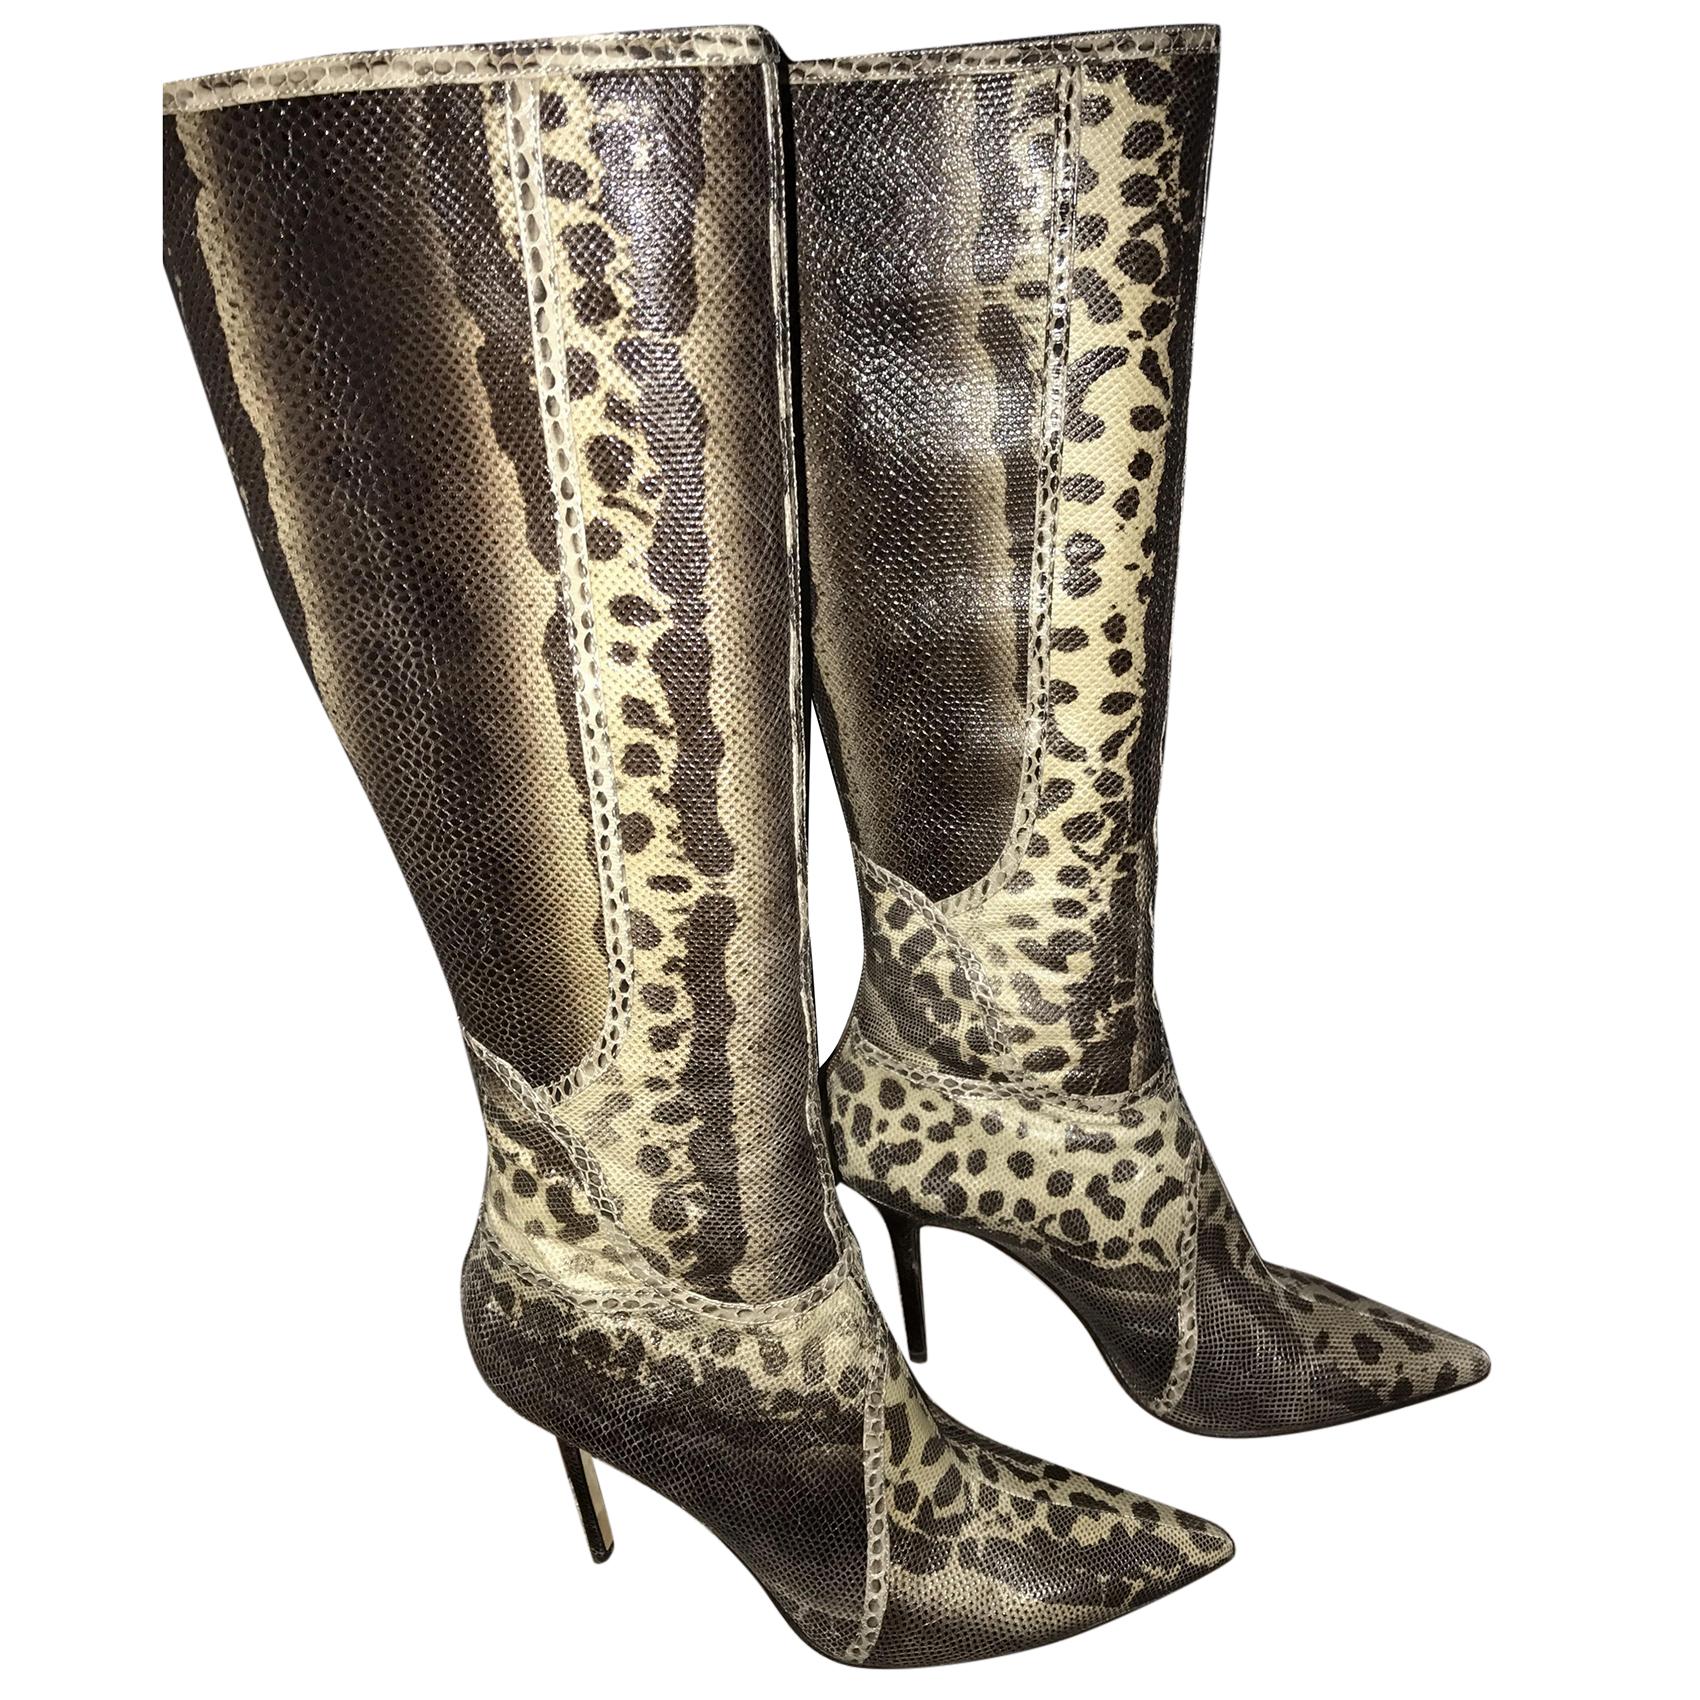 Jimmy Choo Snakeskin Boots | HEWI